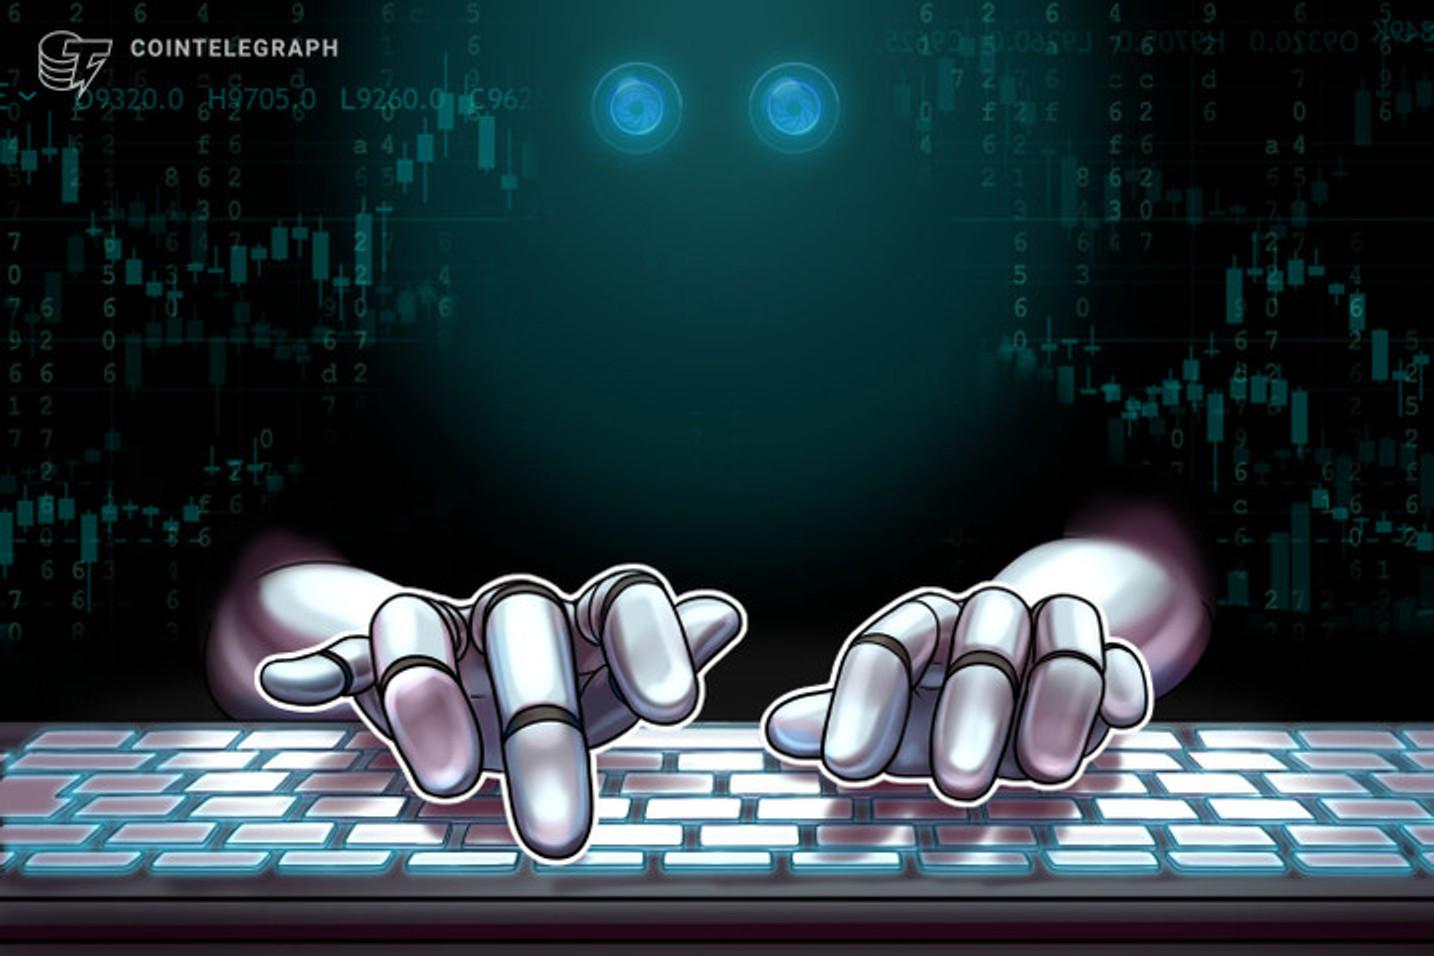 Las ciberamenazas que impactaron a México en el primer semestre incluyen malware para minería de criptomonedas